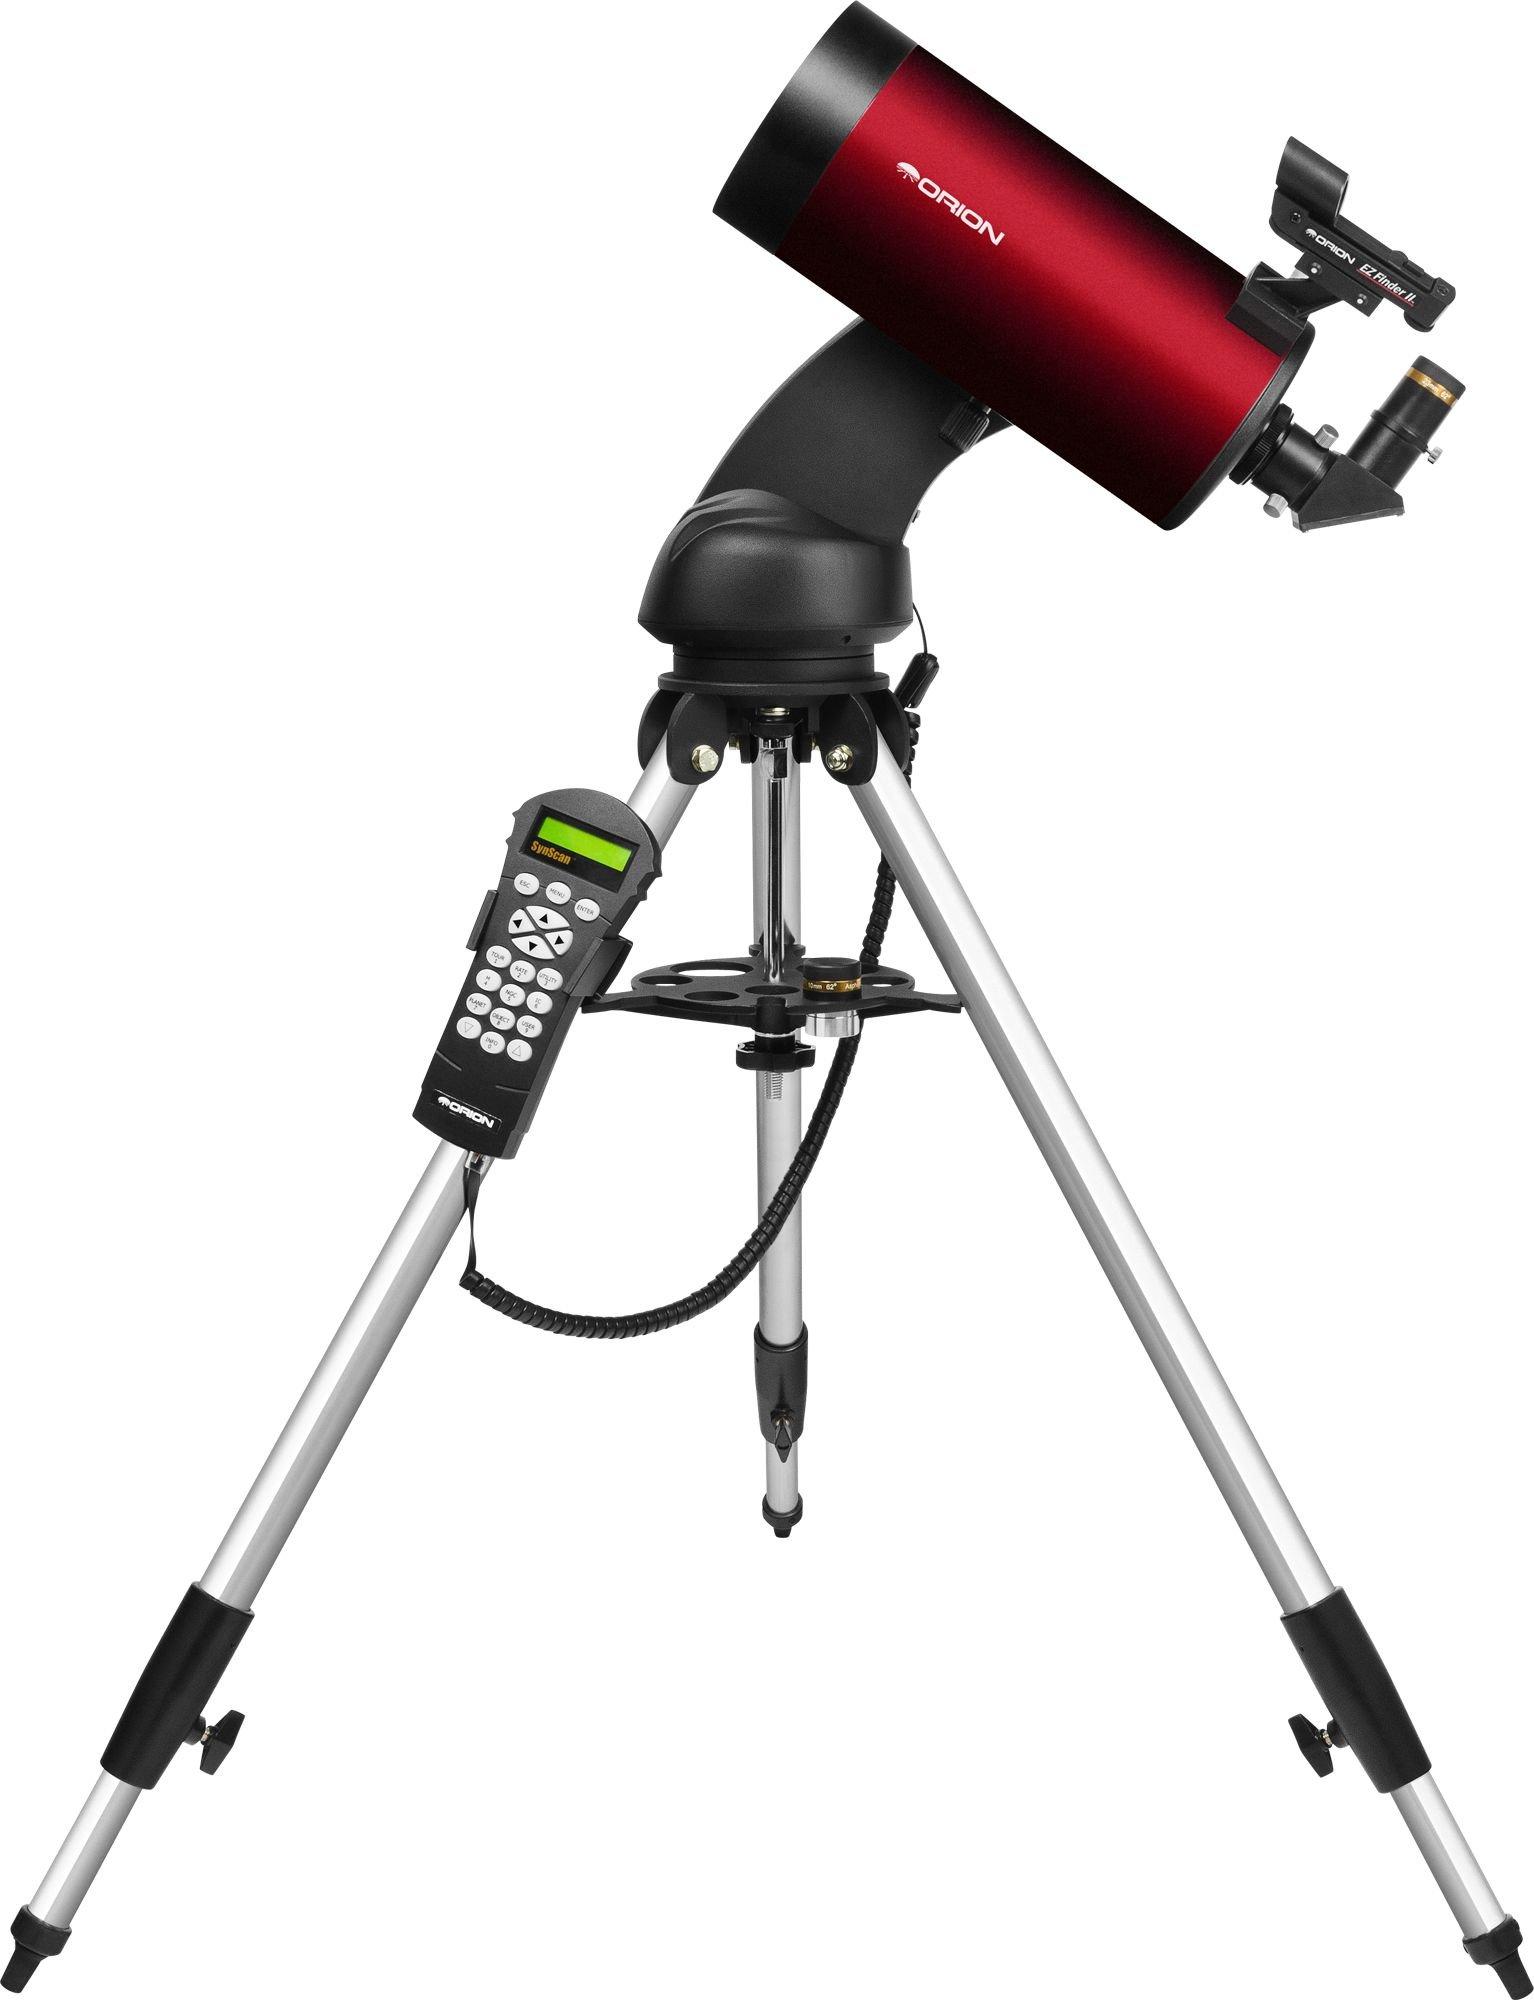 Orion 13163 StarSeeker IV 127mm GoTo Mak-Cass Telescope (Burgundy)